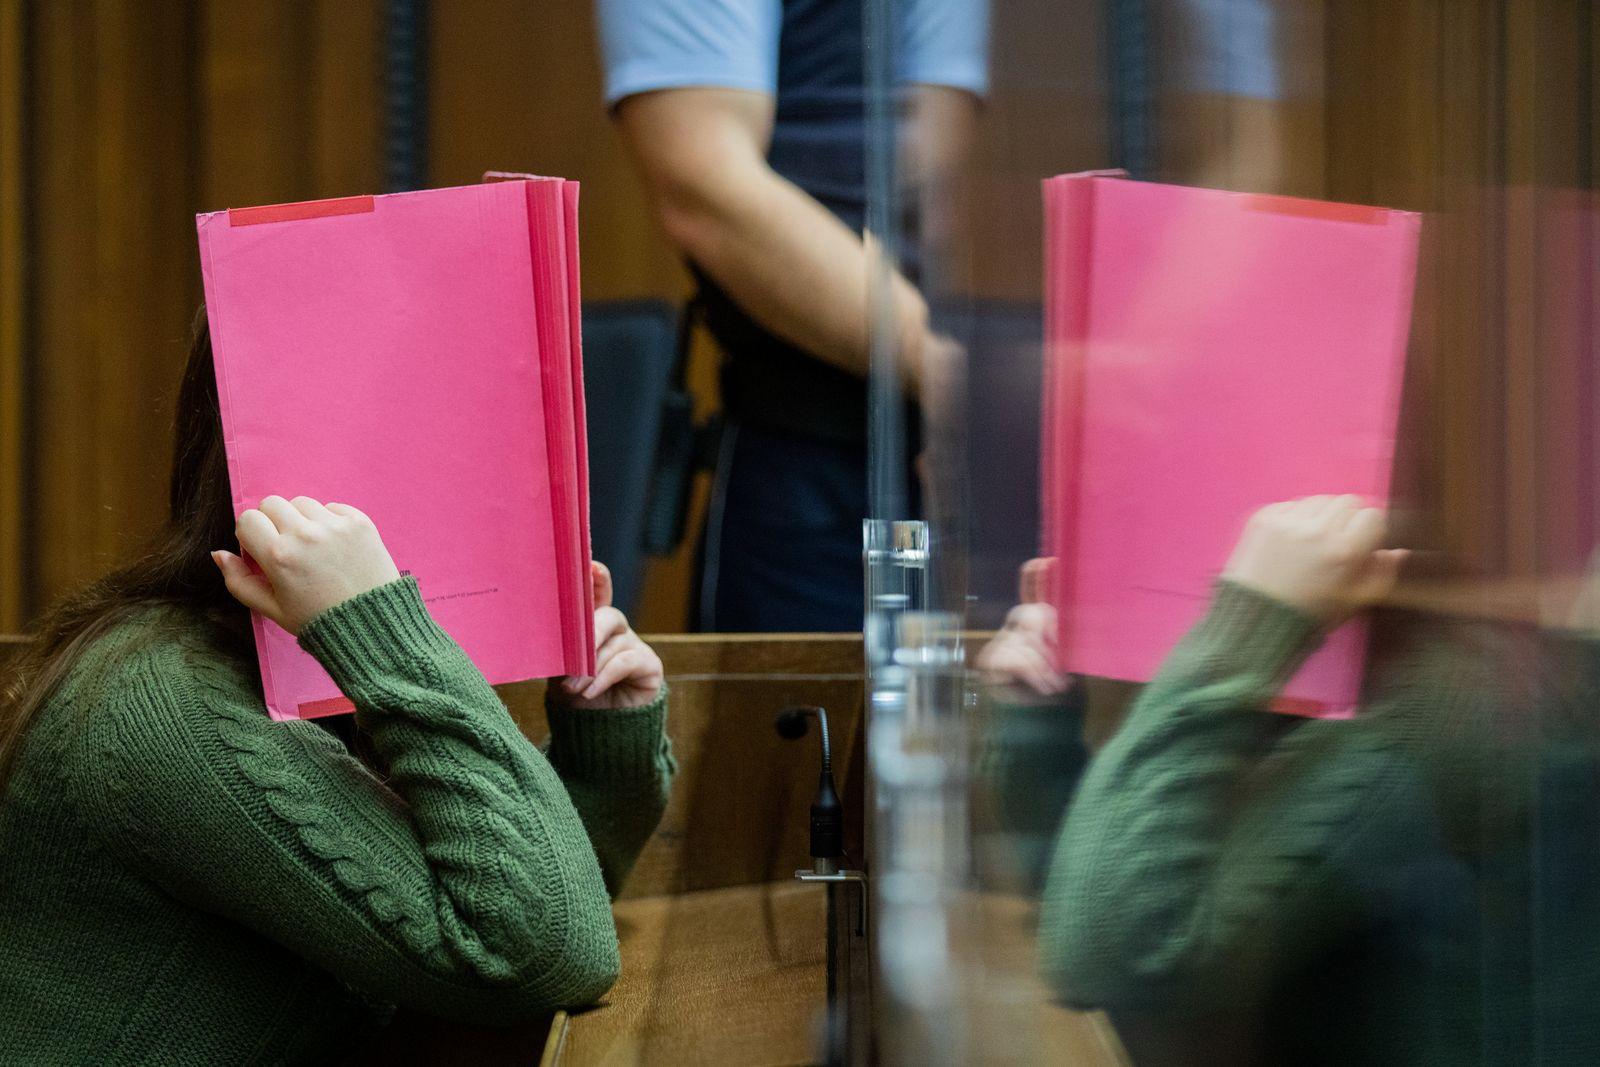 Mordfall Greta - Prozessbeginn gegen Erzieherin